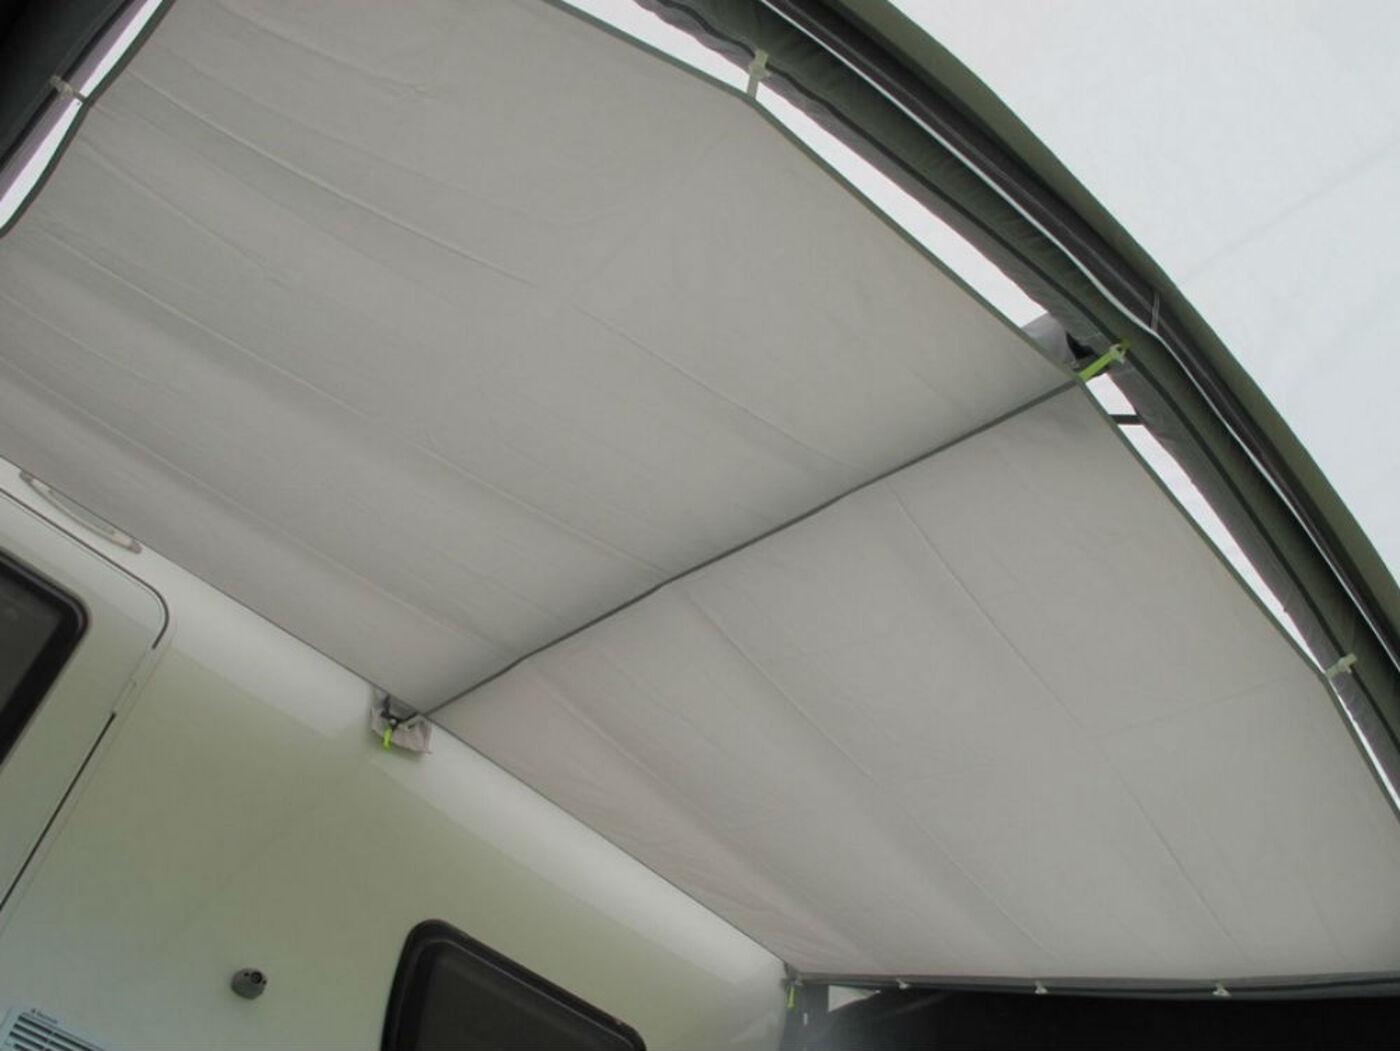 Accessory Shop Kampa Fiesta Air Pro 280 Roof Lining 2015